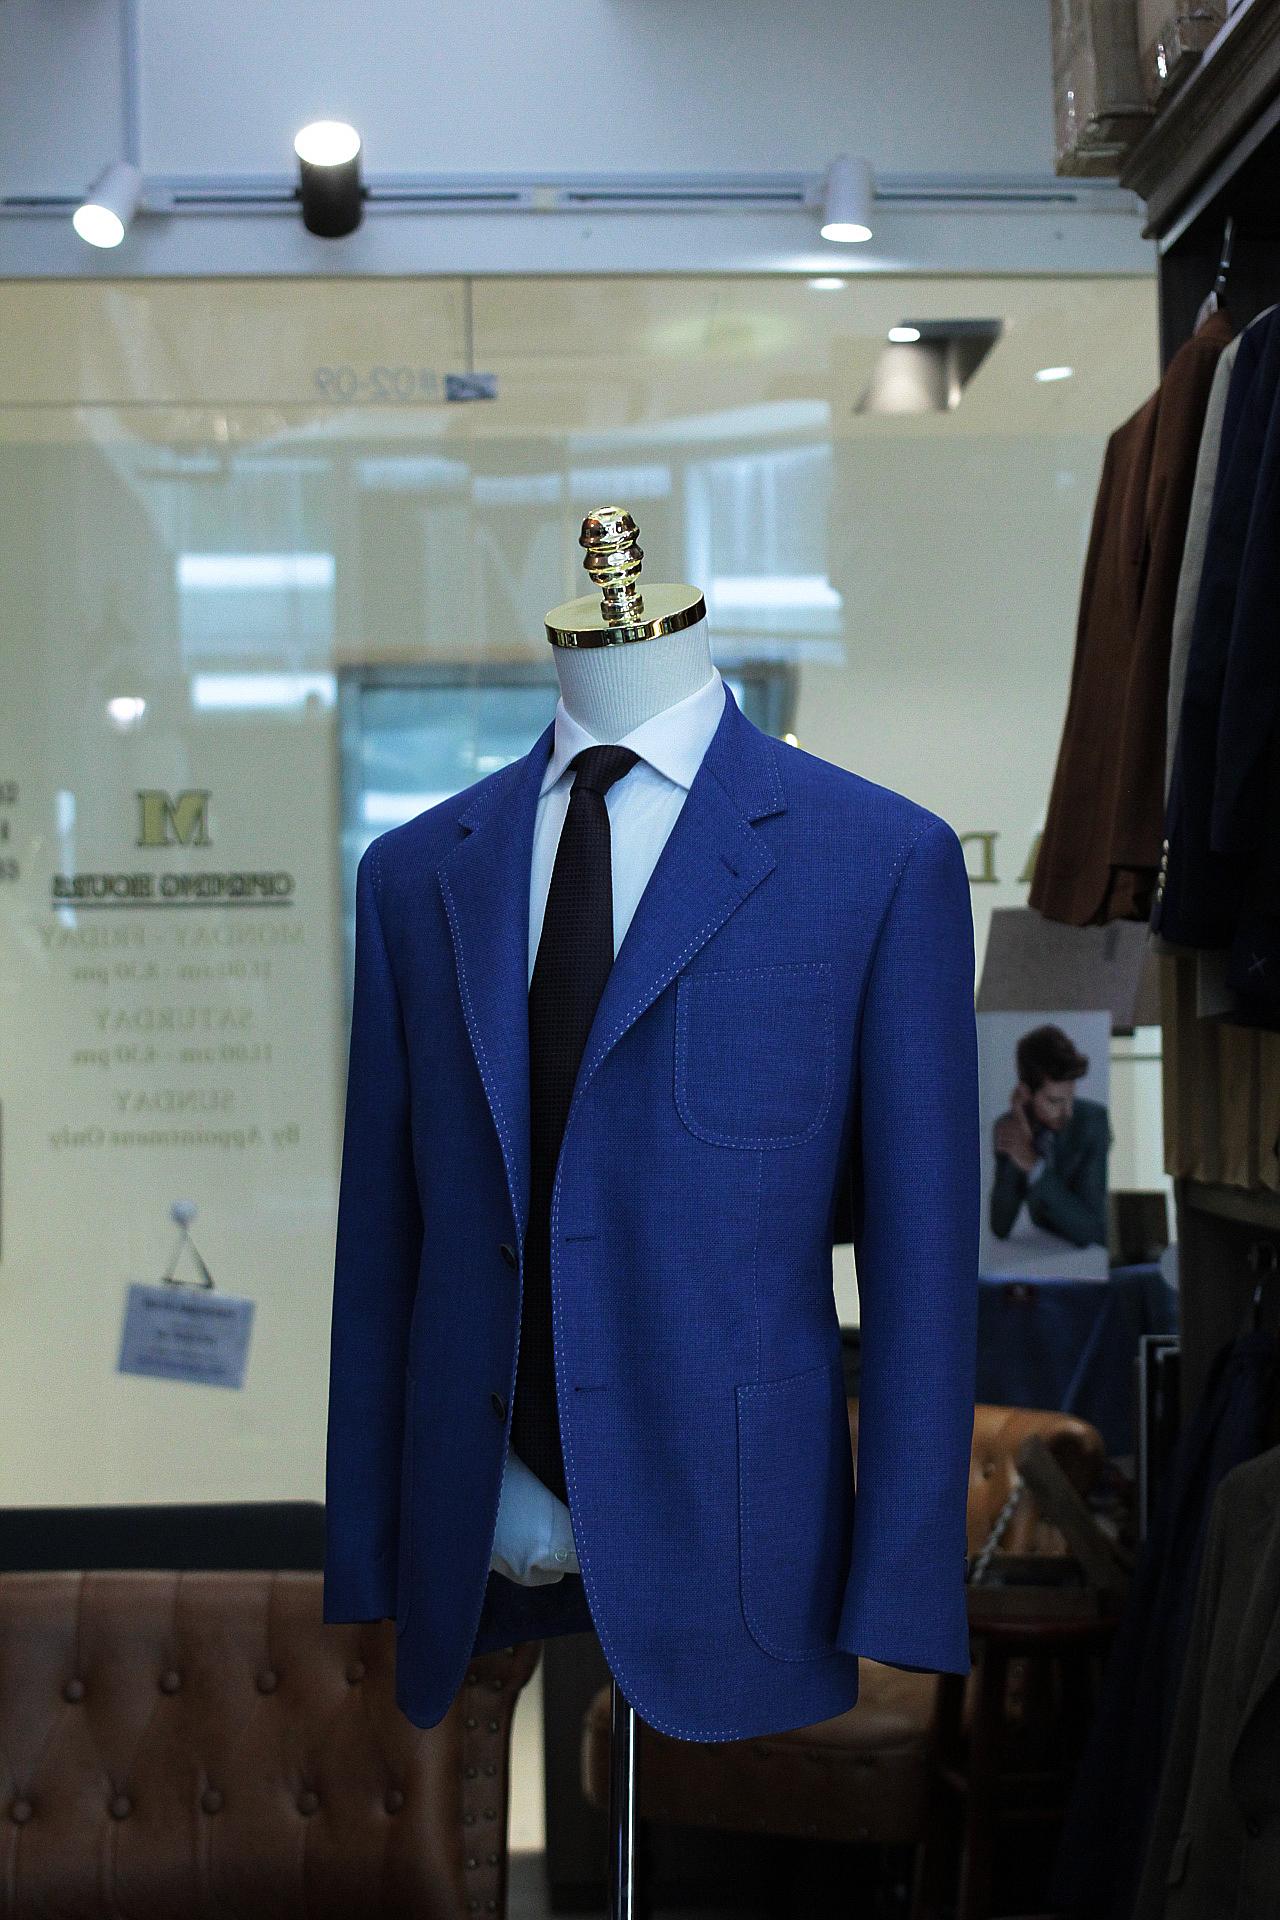 BLUEFEEL | DRAGO | HOPSACK | SUPER 140s Bluefeel hopsack drago spa | made suits | singapore tailor suits side view.JPG